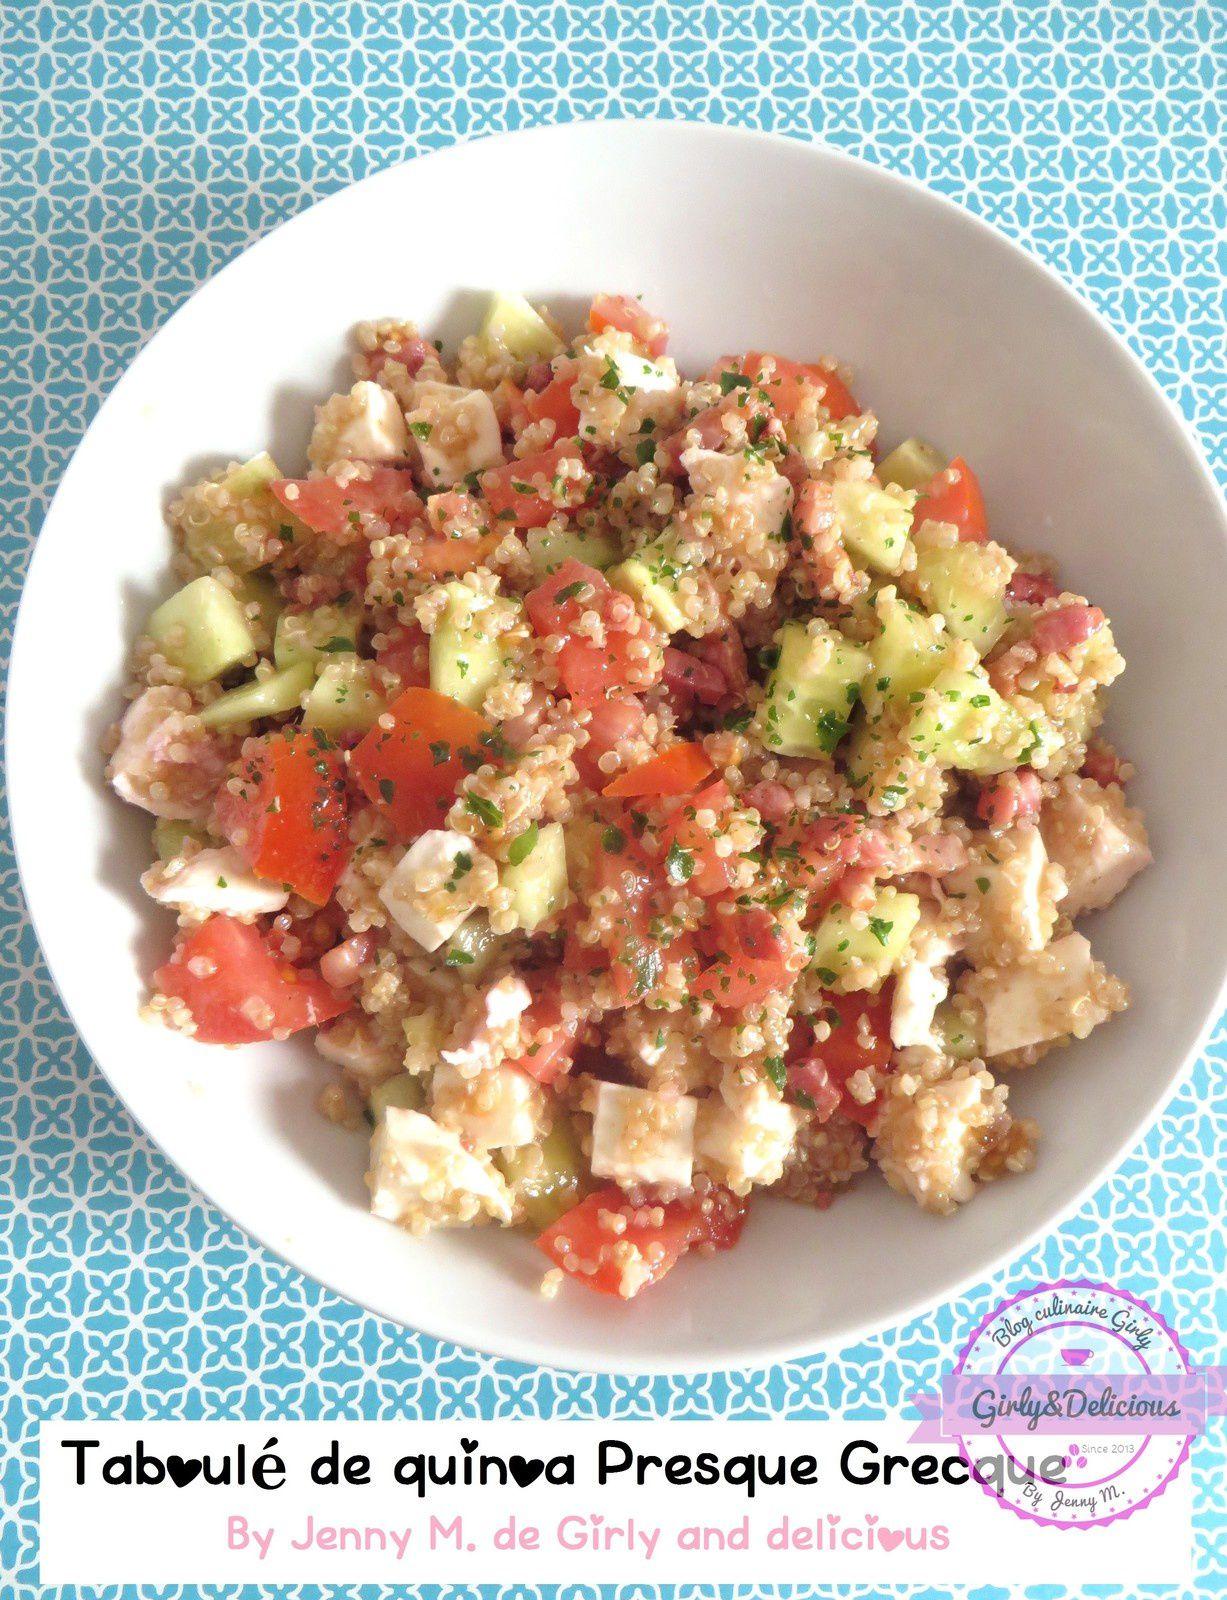 Taboulé de quinoa presque à la Grecque.